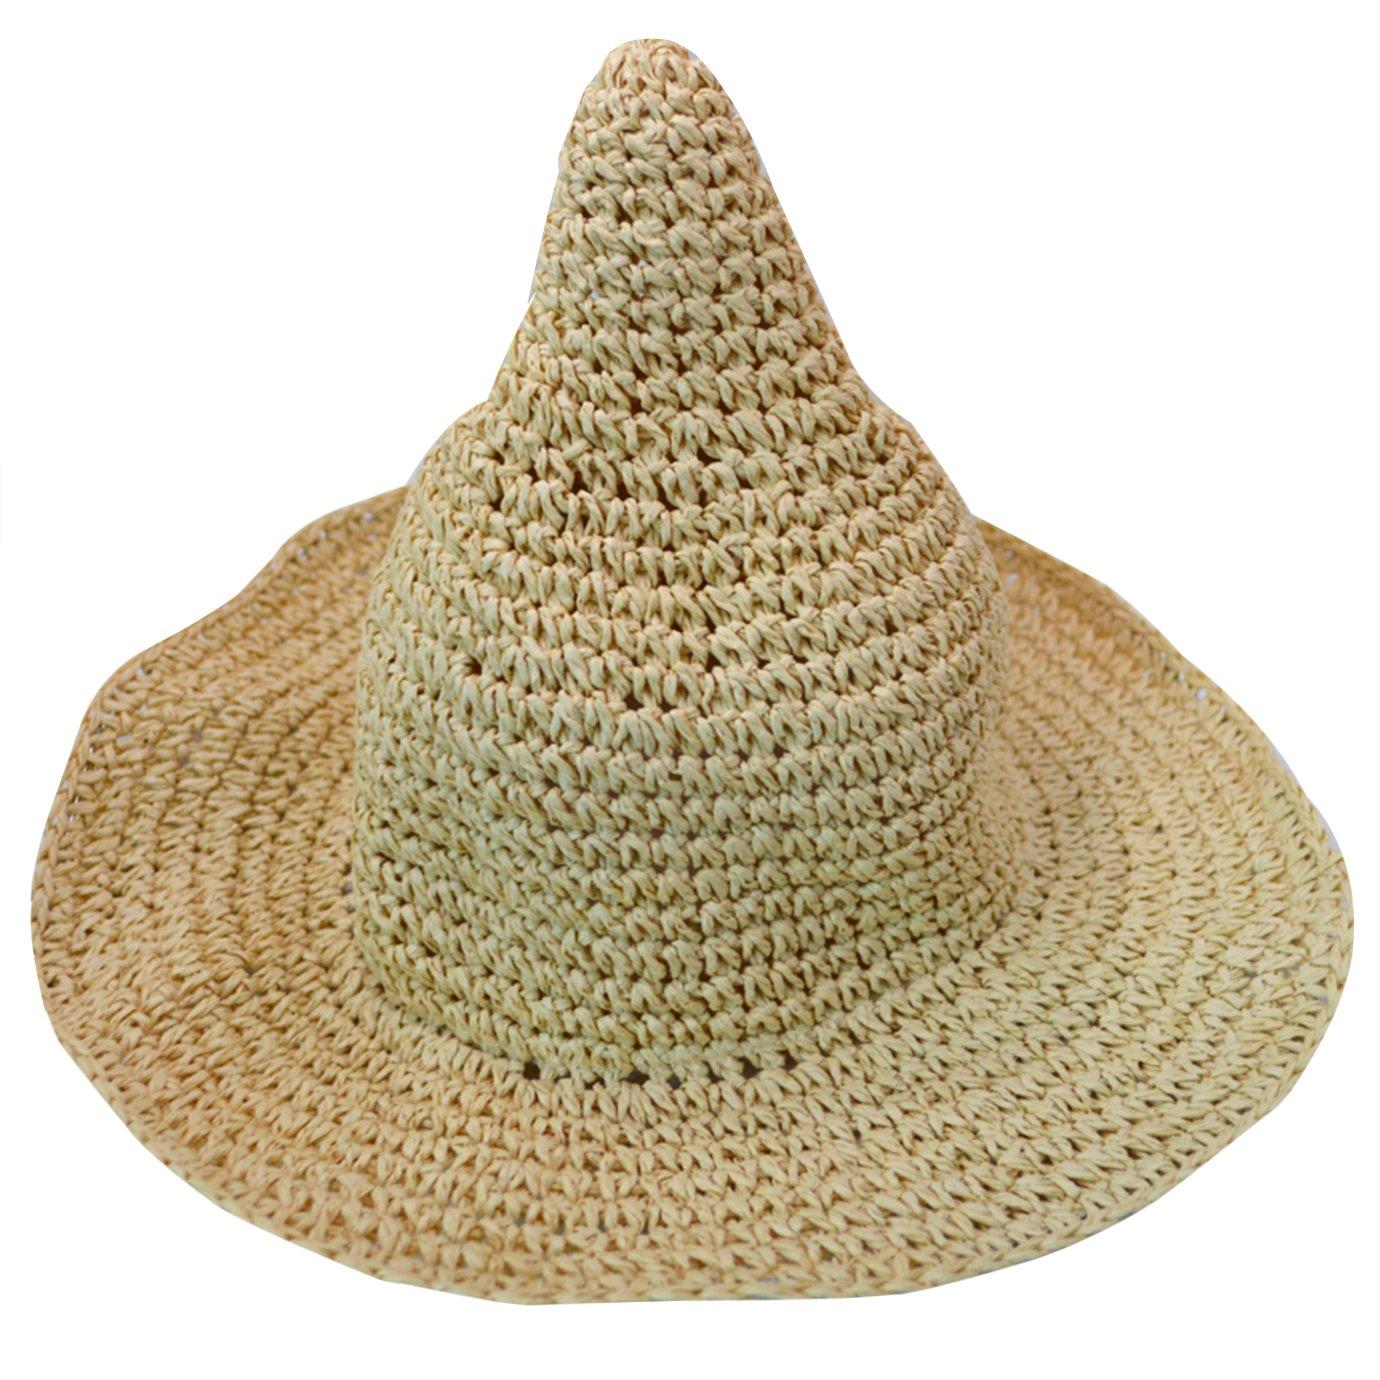 Monique Kids Cute Spire Witch Straw Sun Hat Wide Brim Sun Visor Cap for Beach Party Travel